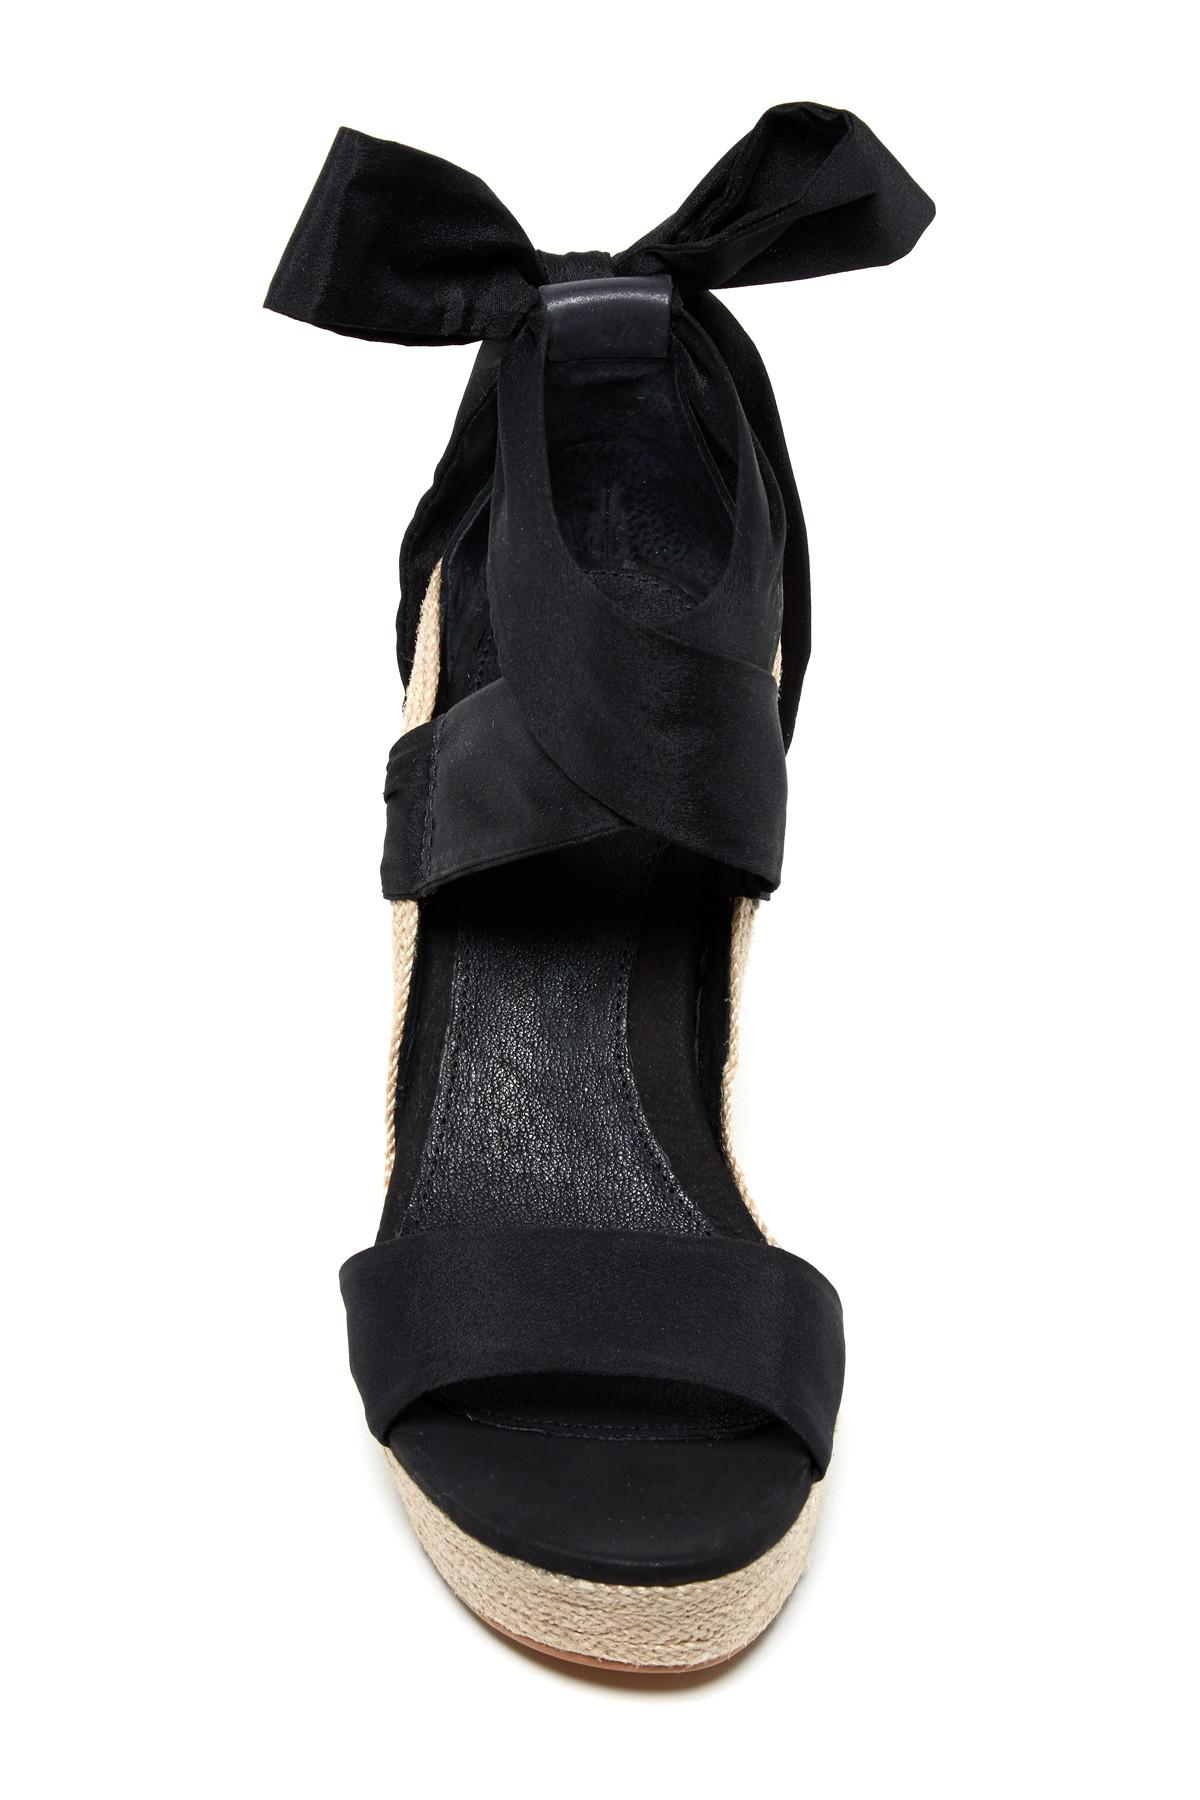 a5a10a9eac UGG Jules Platform Wedge Sandal in Black - Lyst